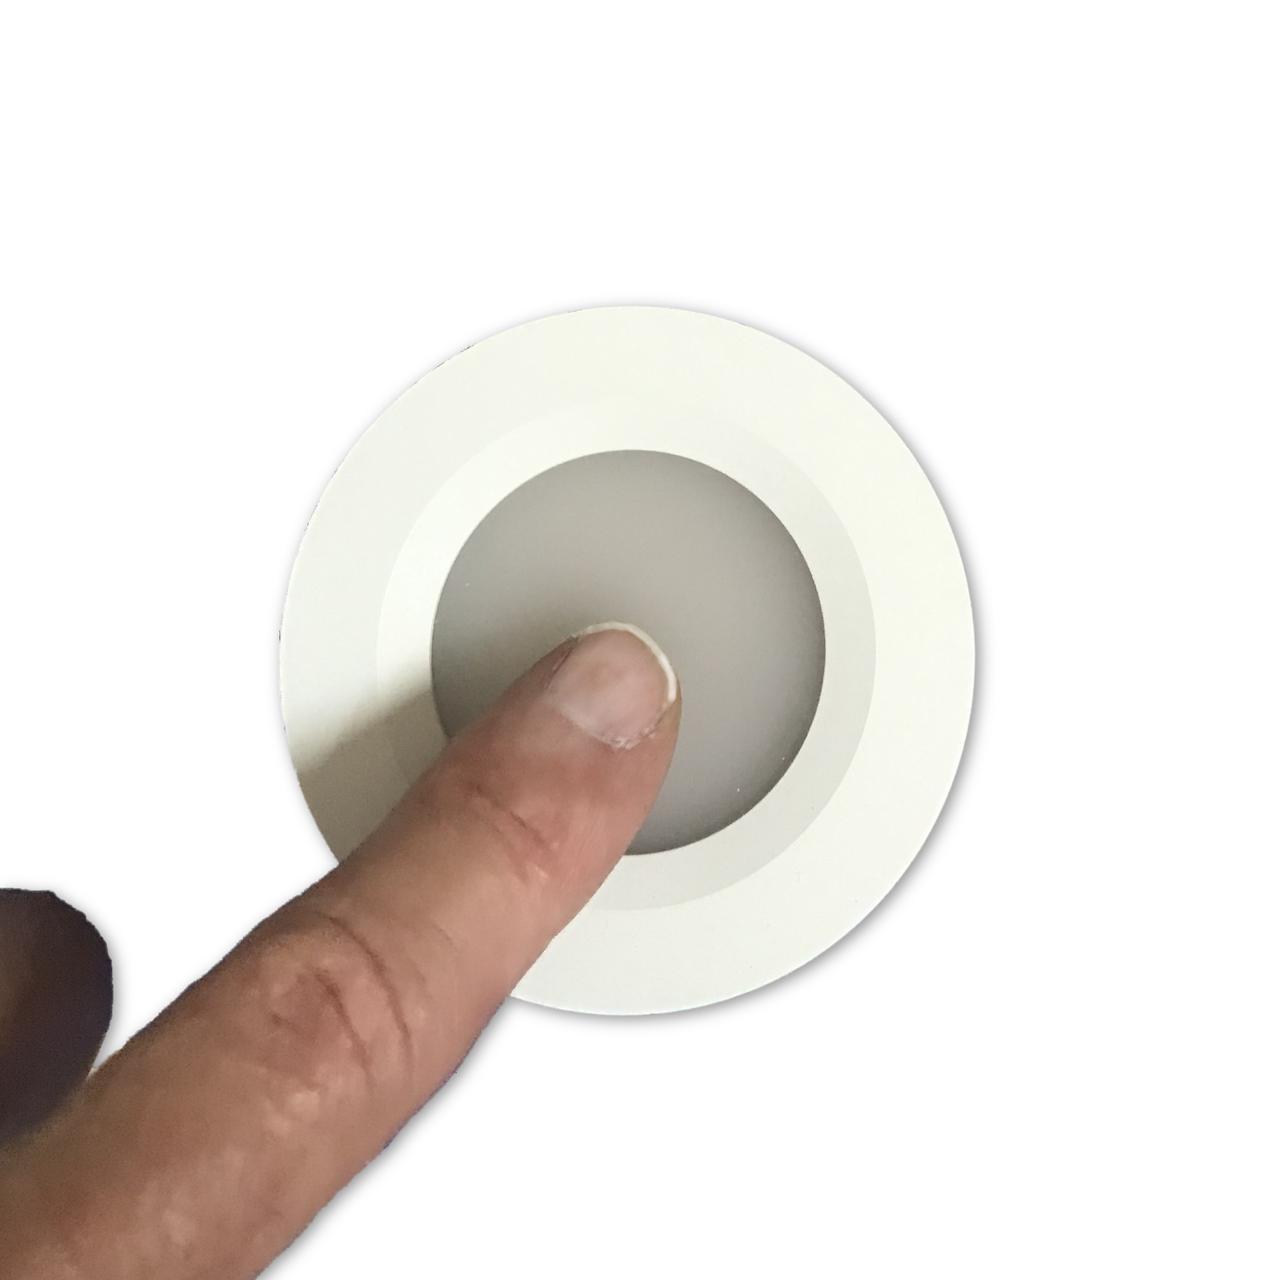 Flush mounted recessed LED cabin light downlight